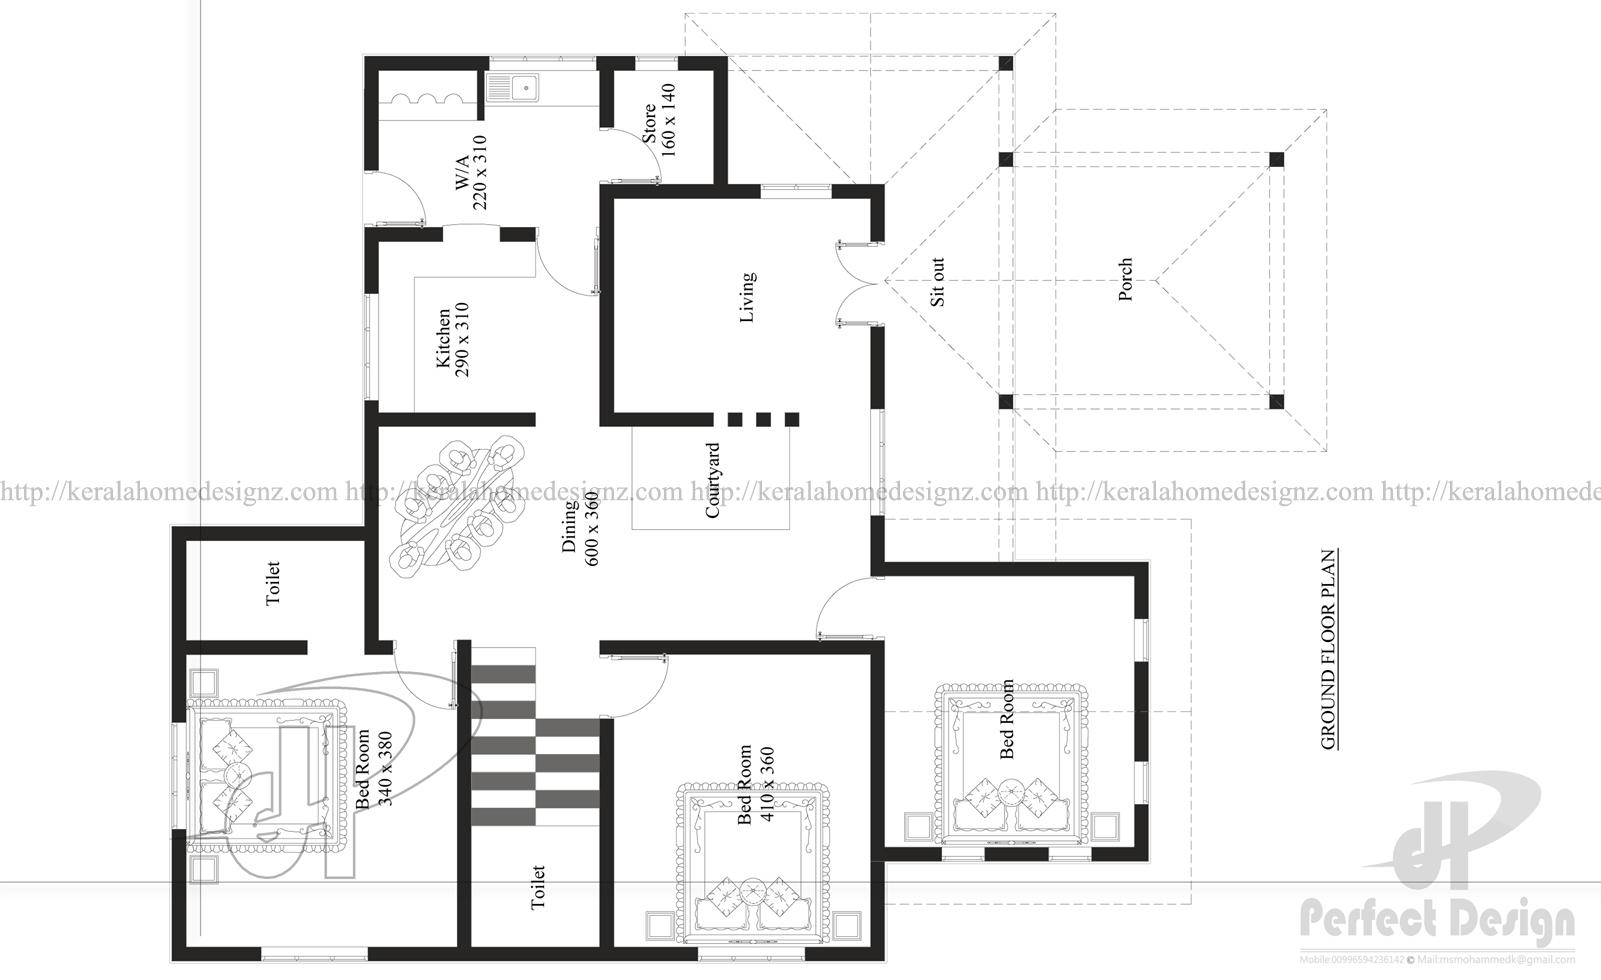 1345 Sq Ft Beautiful Home Kerala Home Design